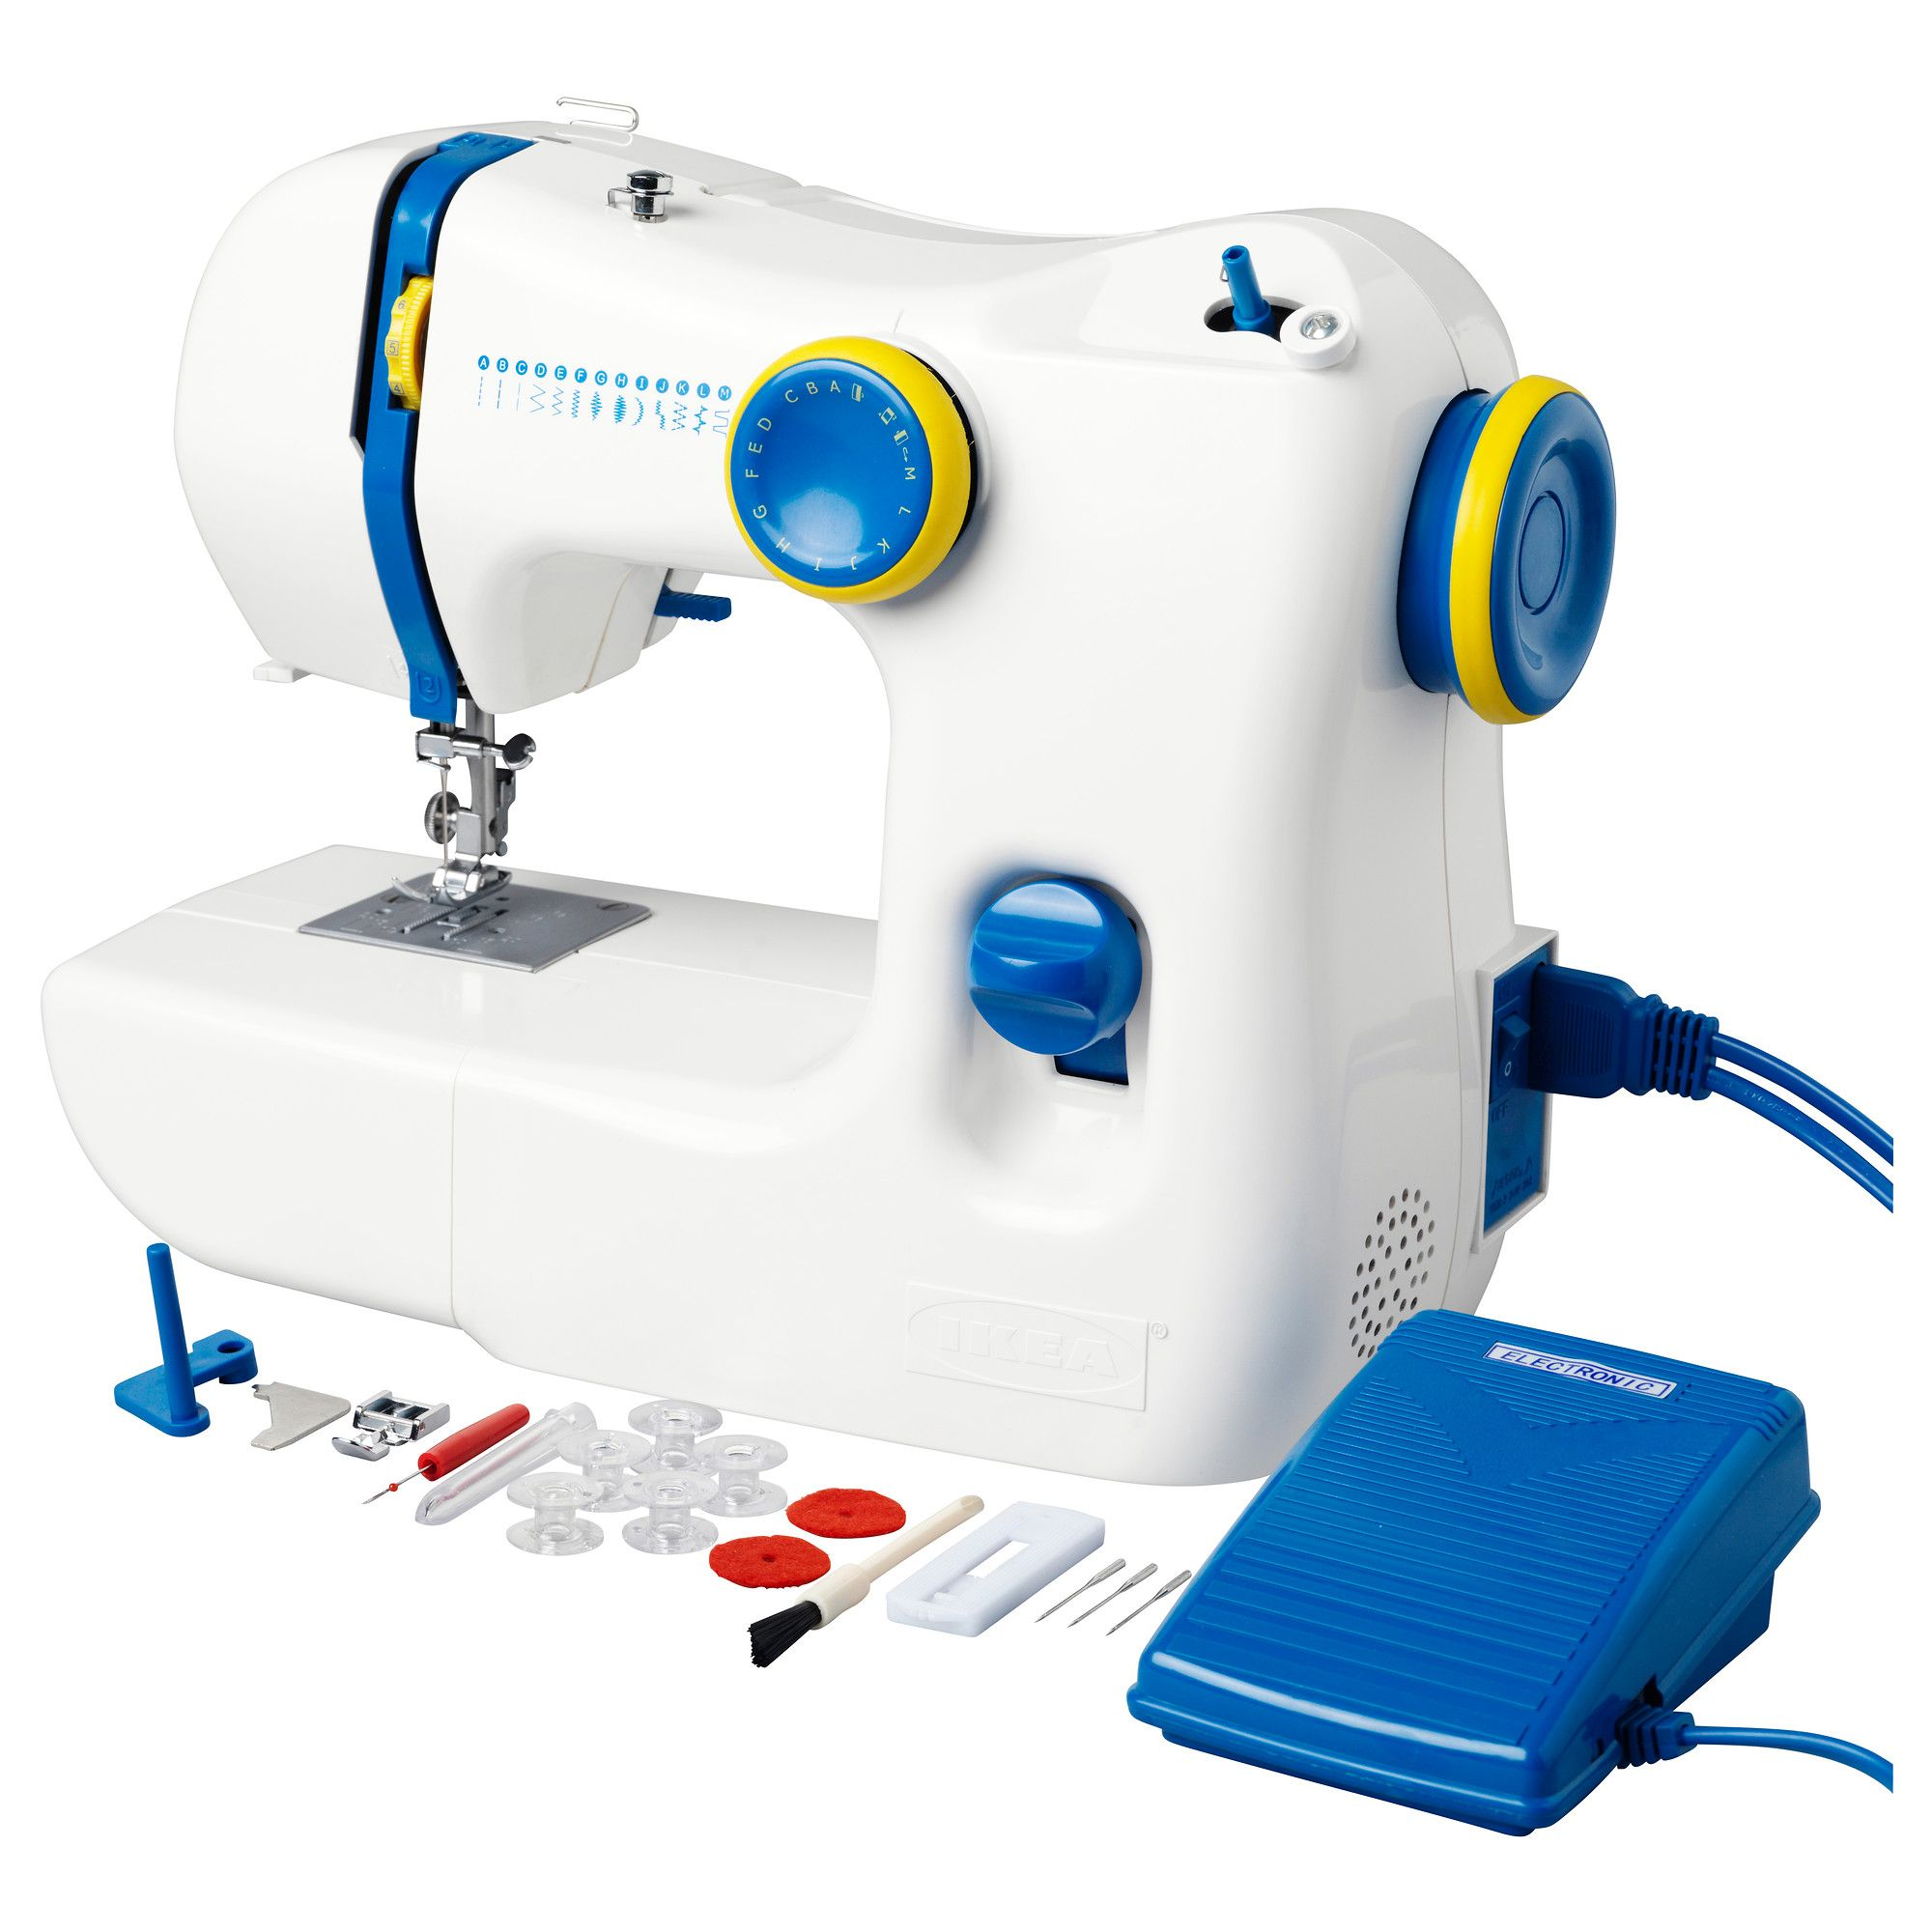 ikea sewing machine instruction manual